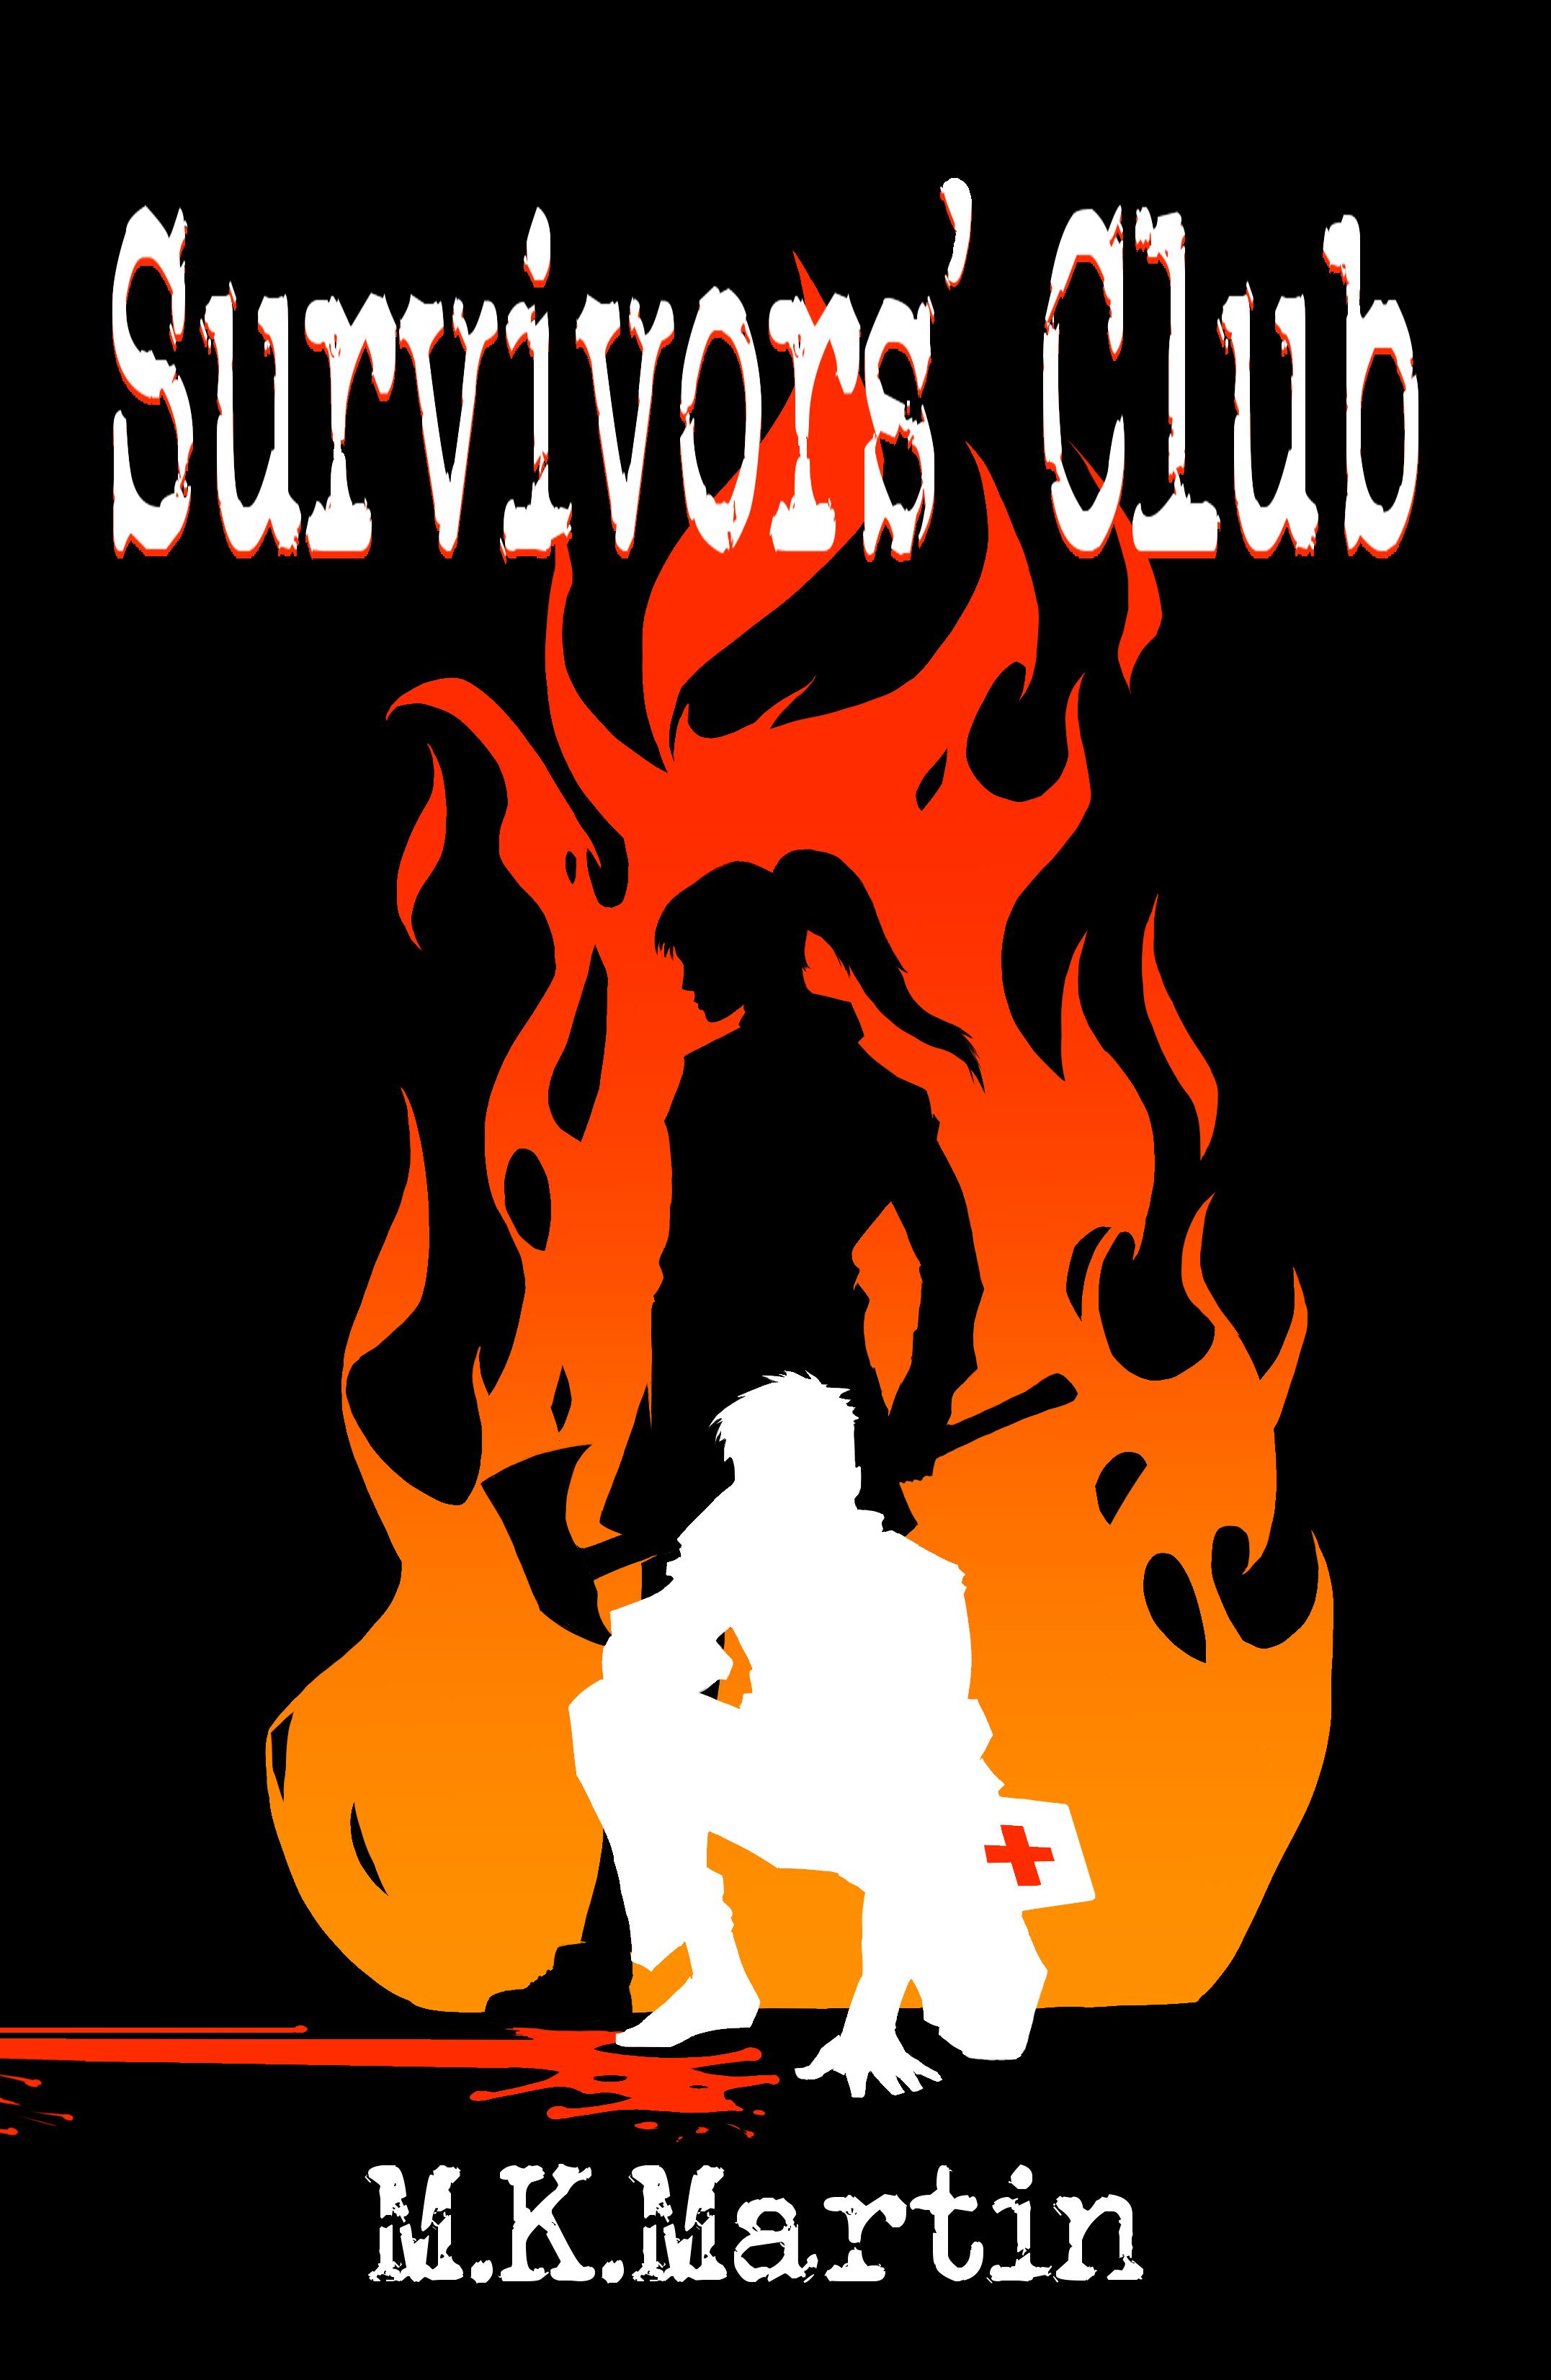 Survivor's Club Final Kindle cover.jpg